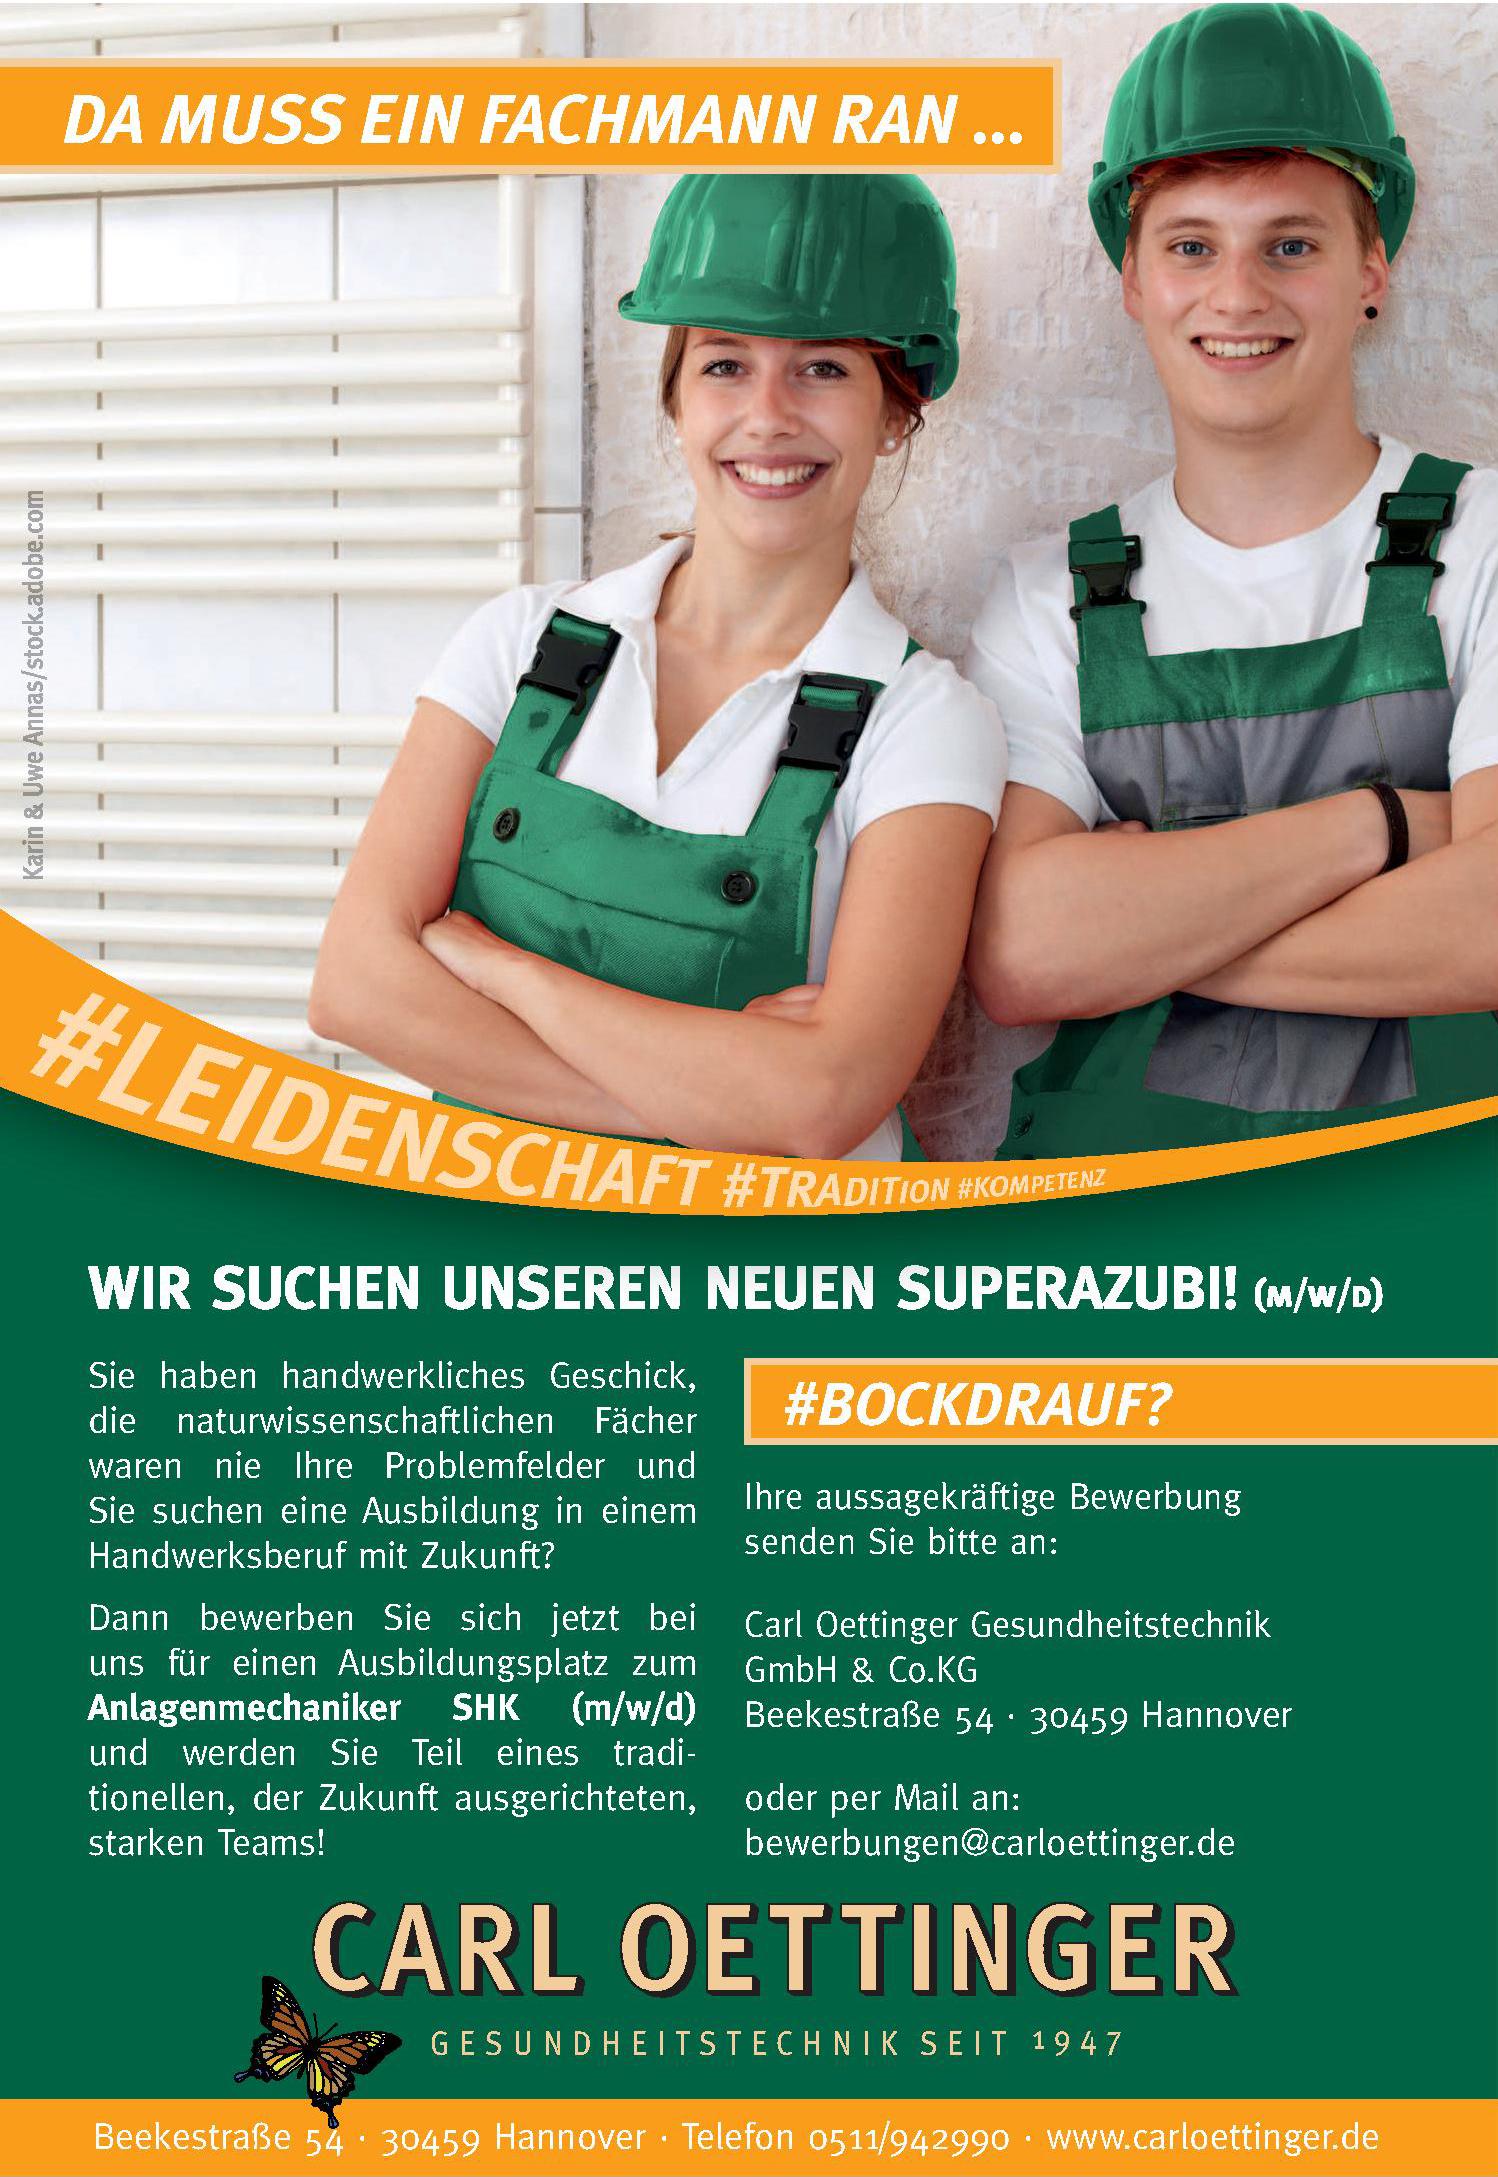 Carl Oettinger Gesundheitstechnik GmbH & Co.KG